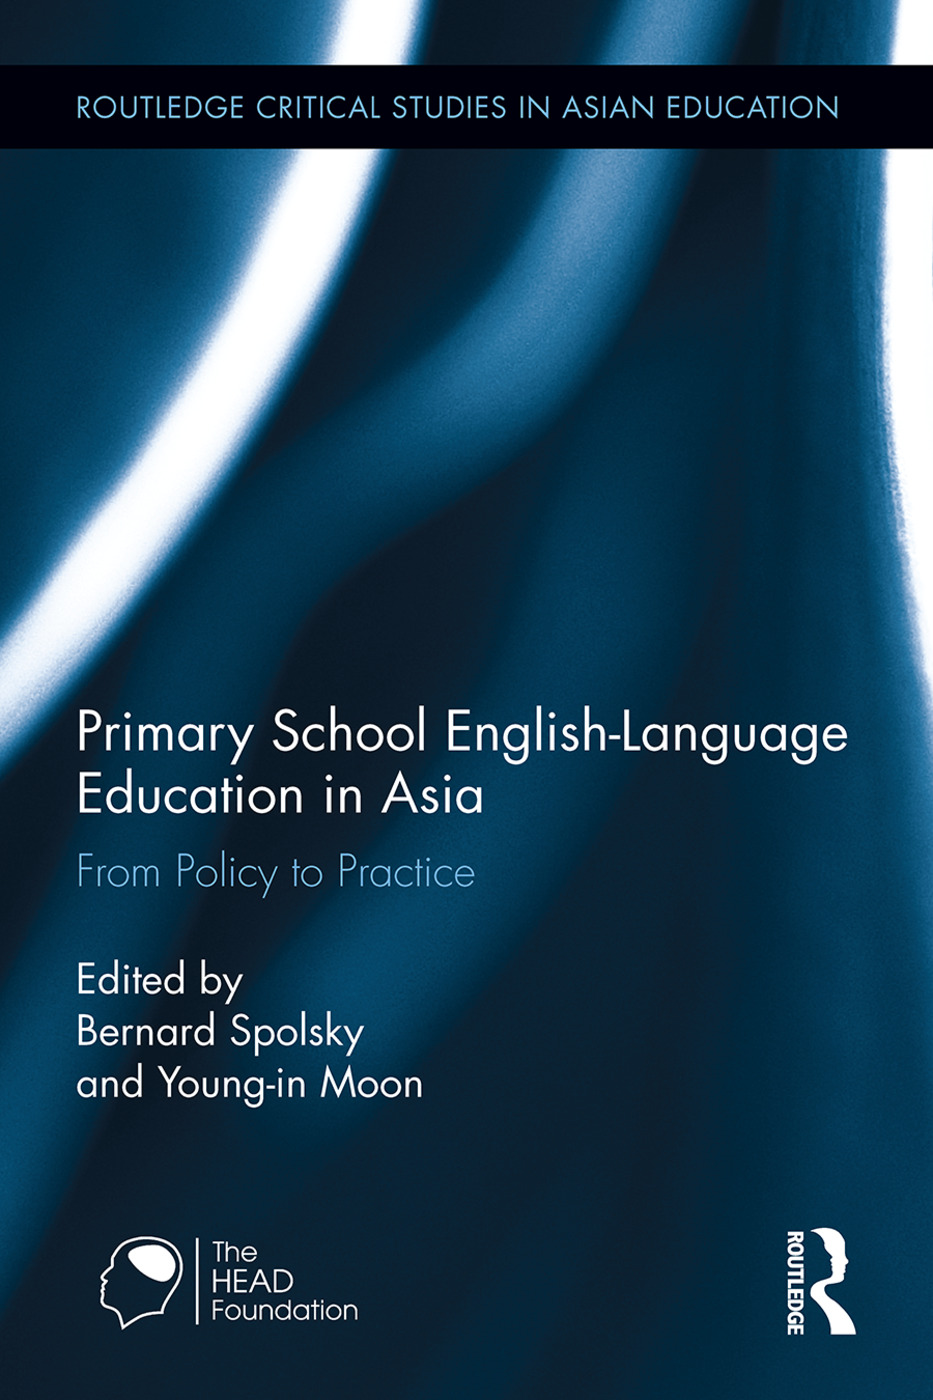 Primary School English-Language Education in Asia